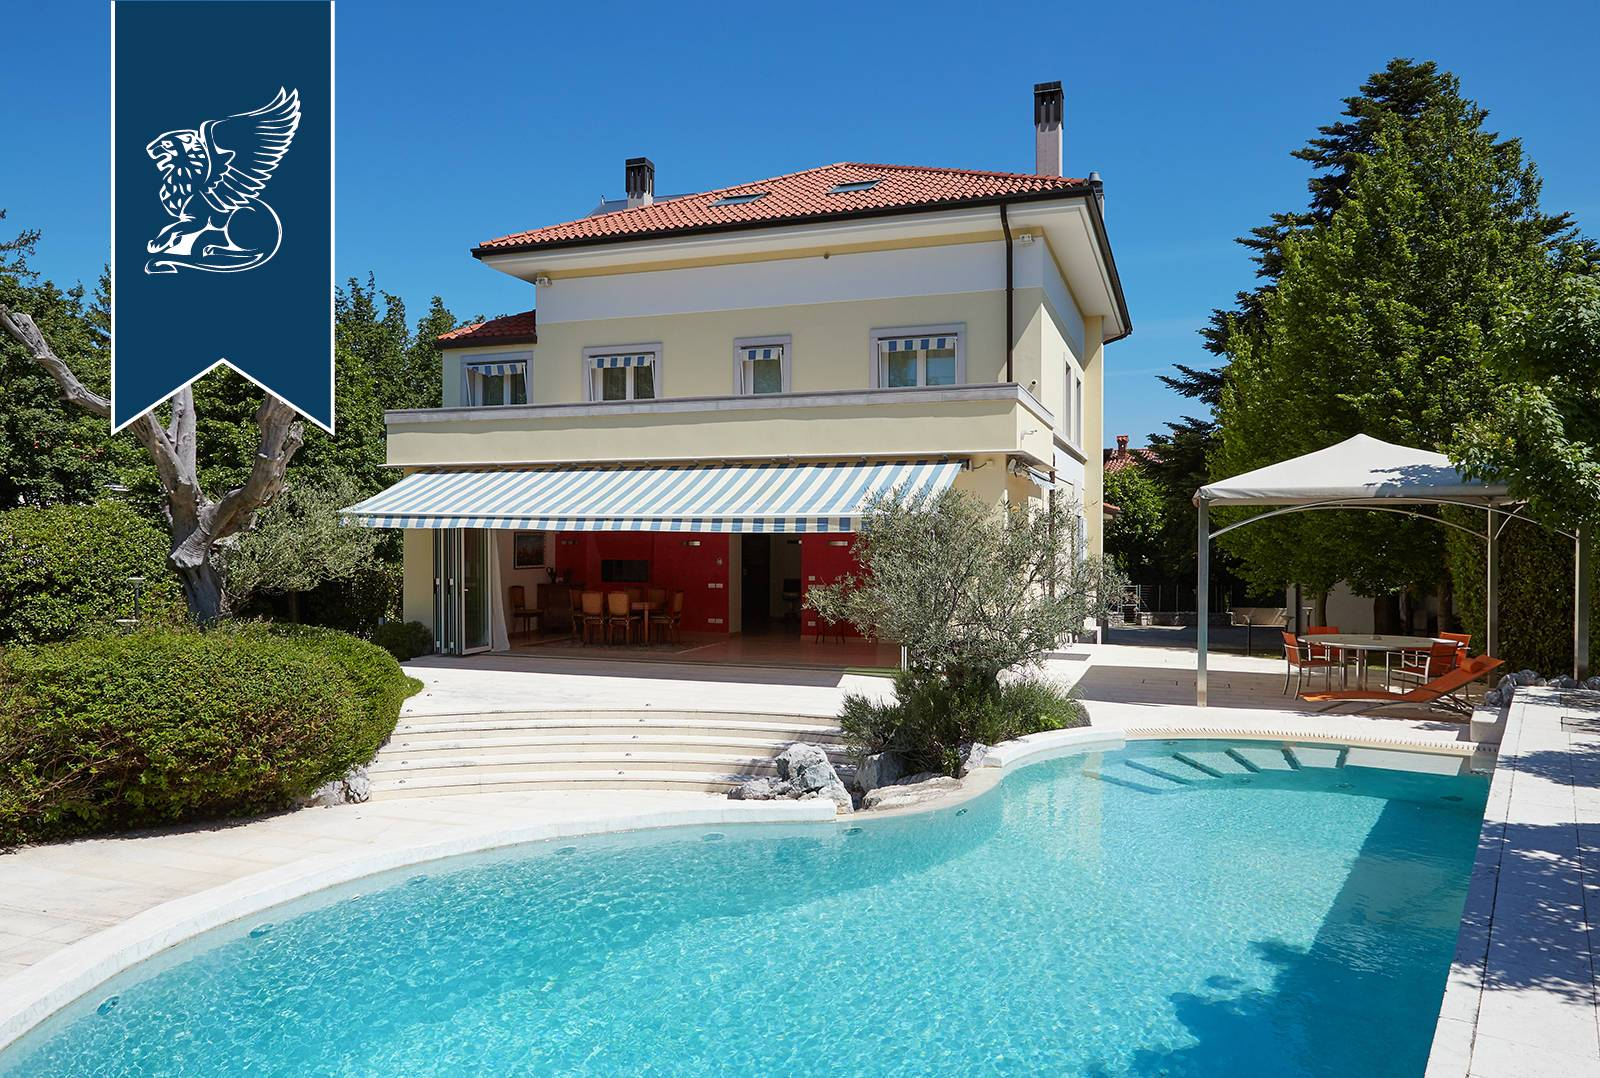 Villa in Vendita a Trieste: 0 locali, 500 mq - Foto 3